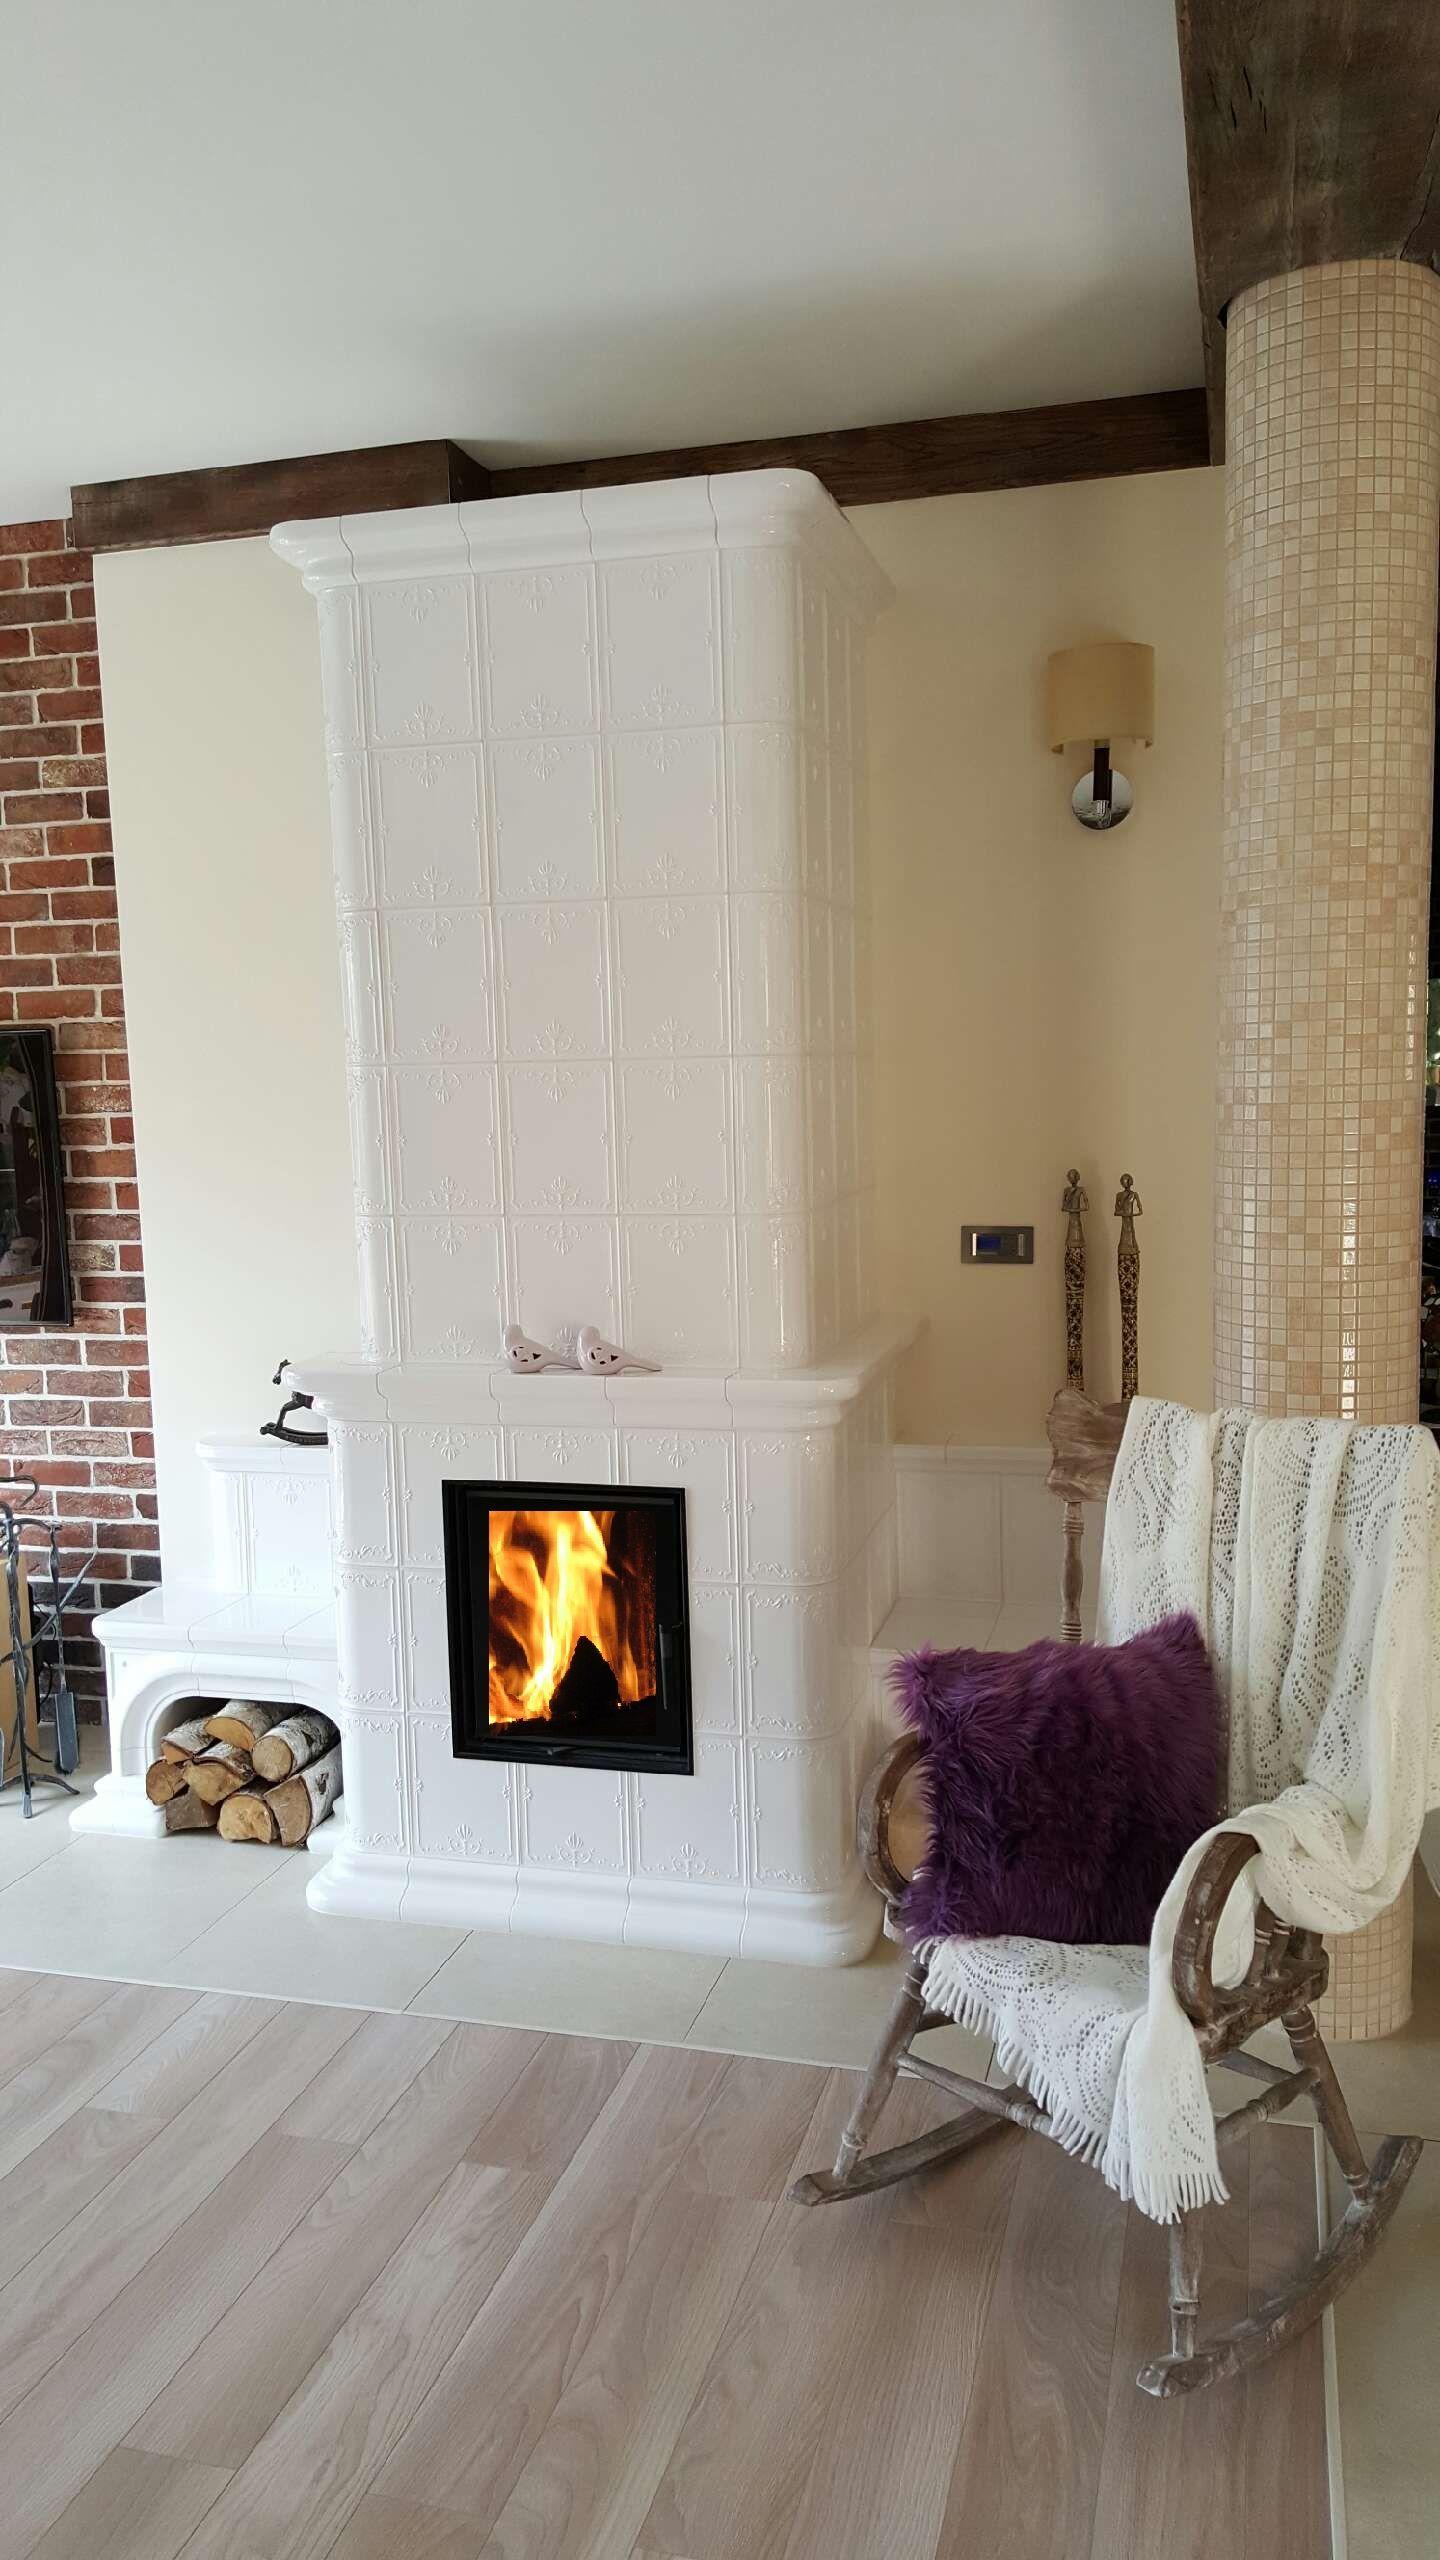 Modern Farm Houses, Rustic Modern, Stove, Fireplaces, Ikea, Nest, Antique